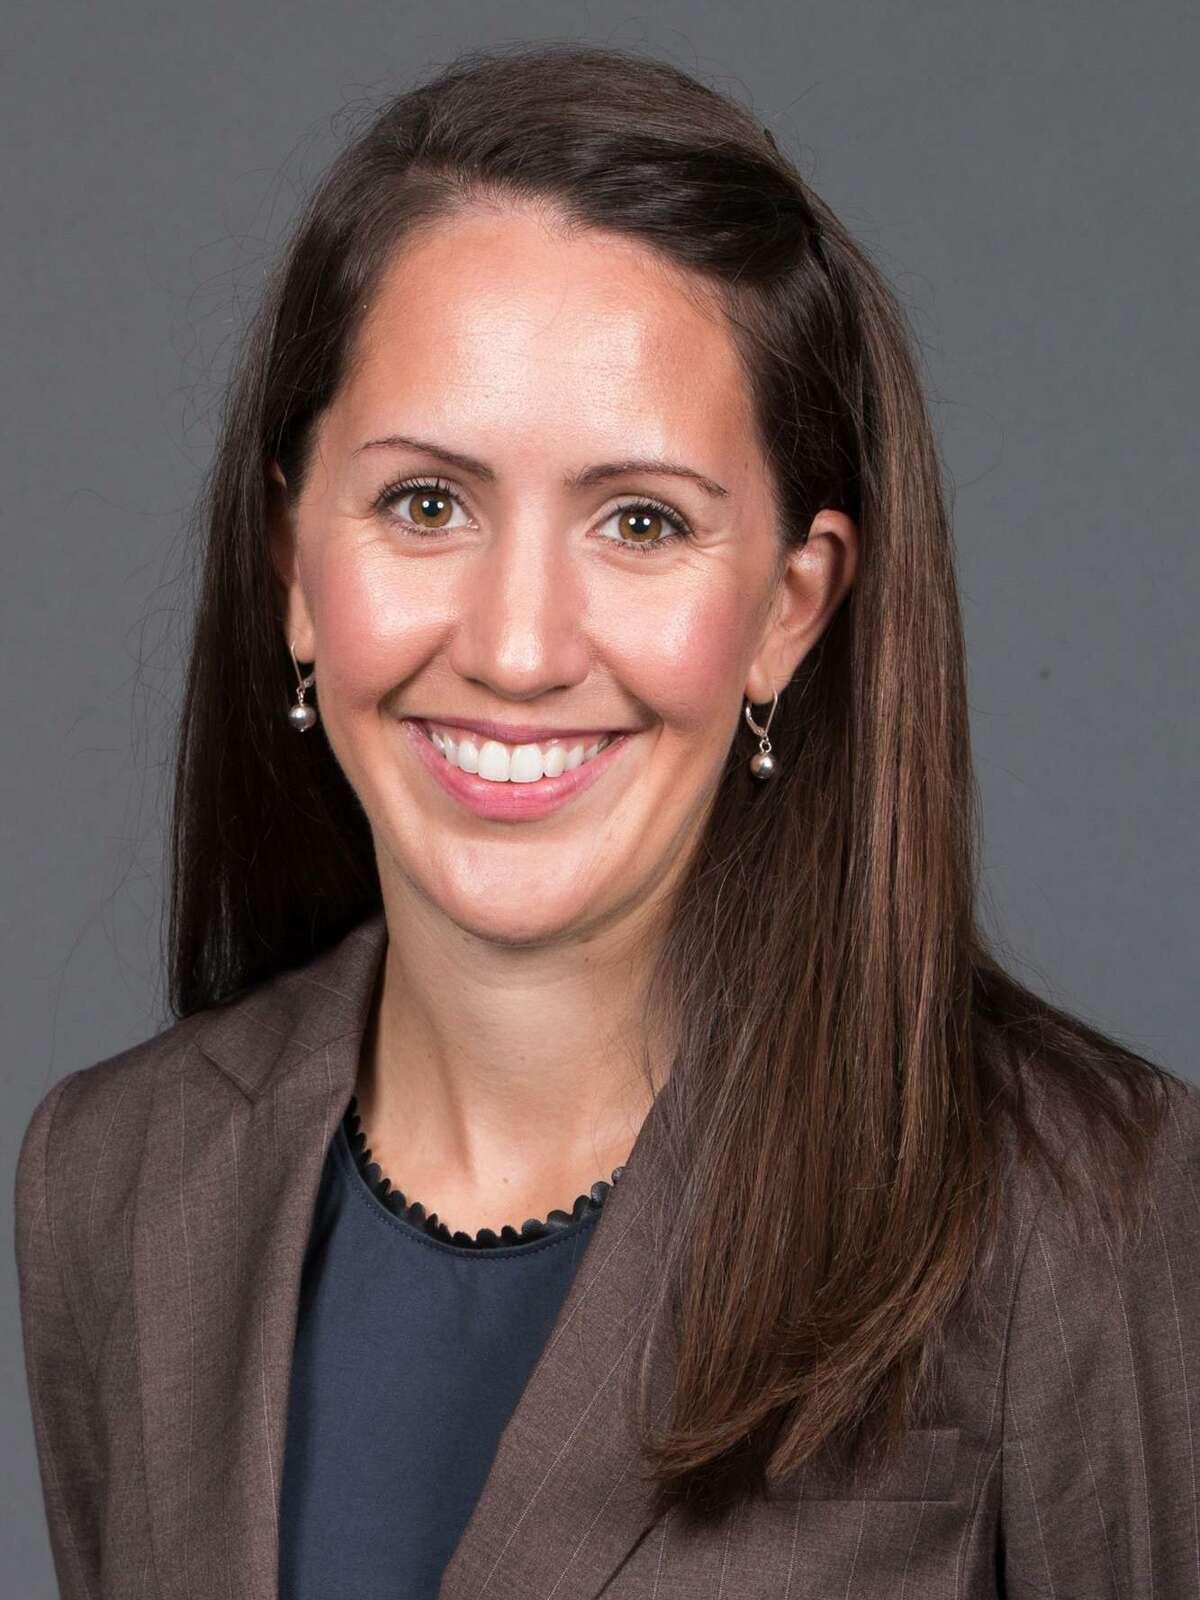 Taryn Sheehan has been named the new Yale women's cross country coach.